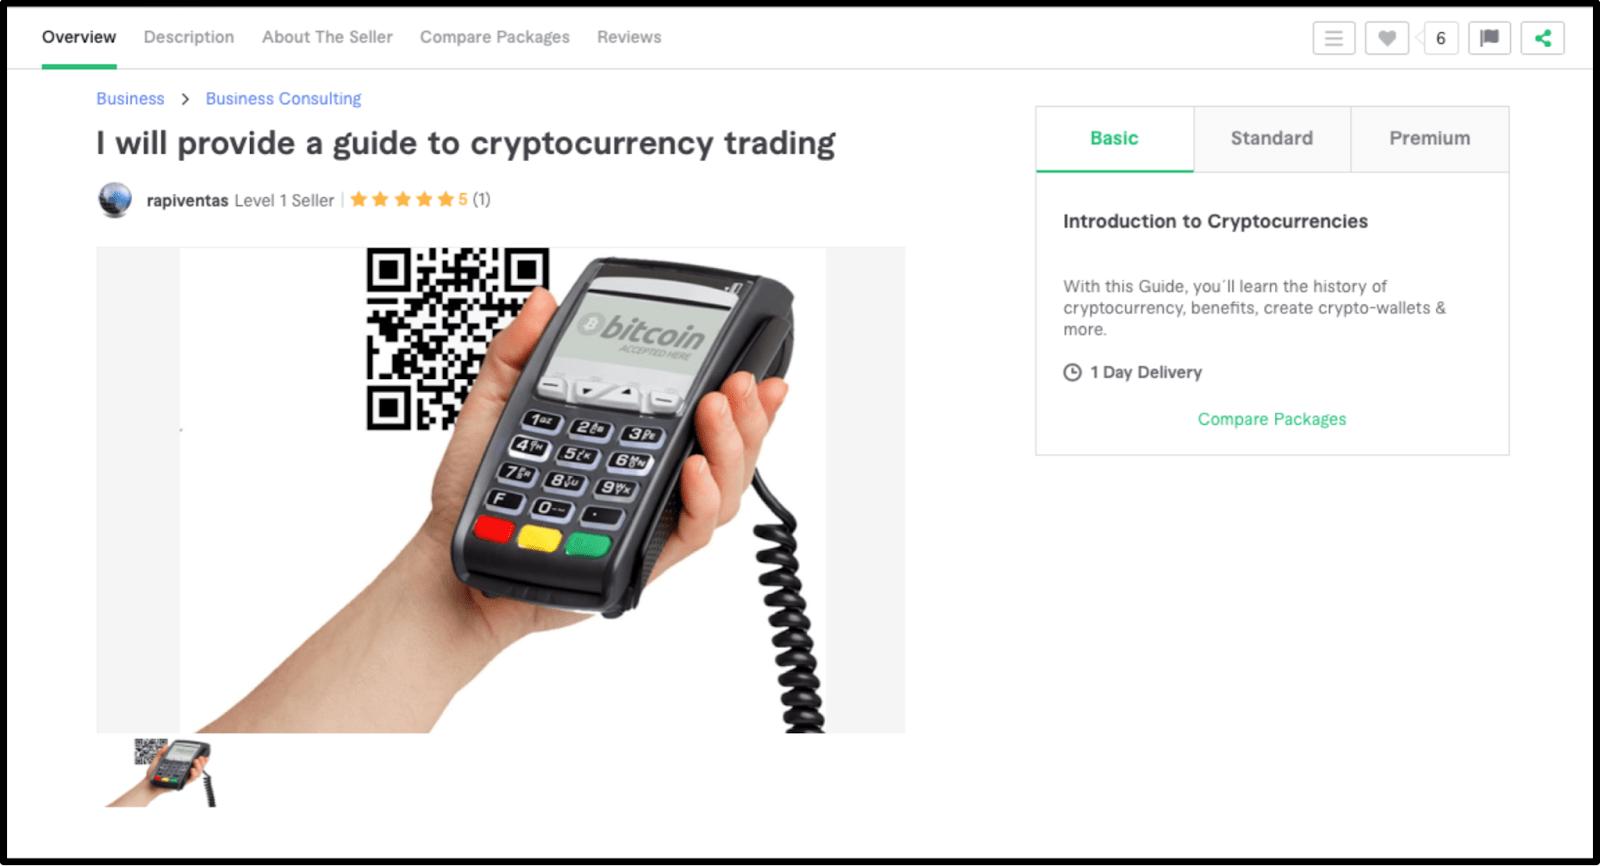 Freelance Bitcoin expert Rapiventas profile on Fiverr